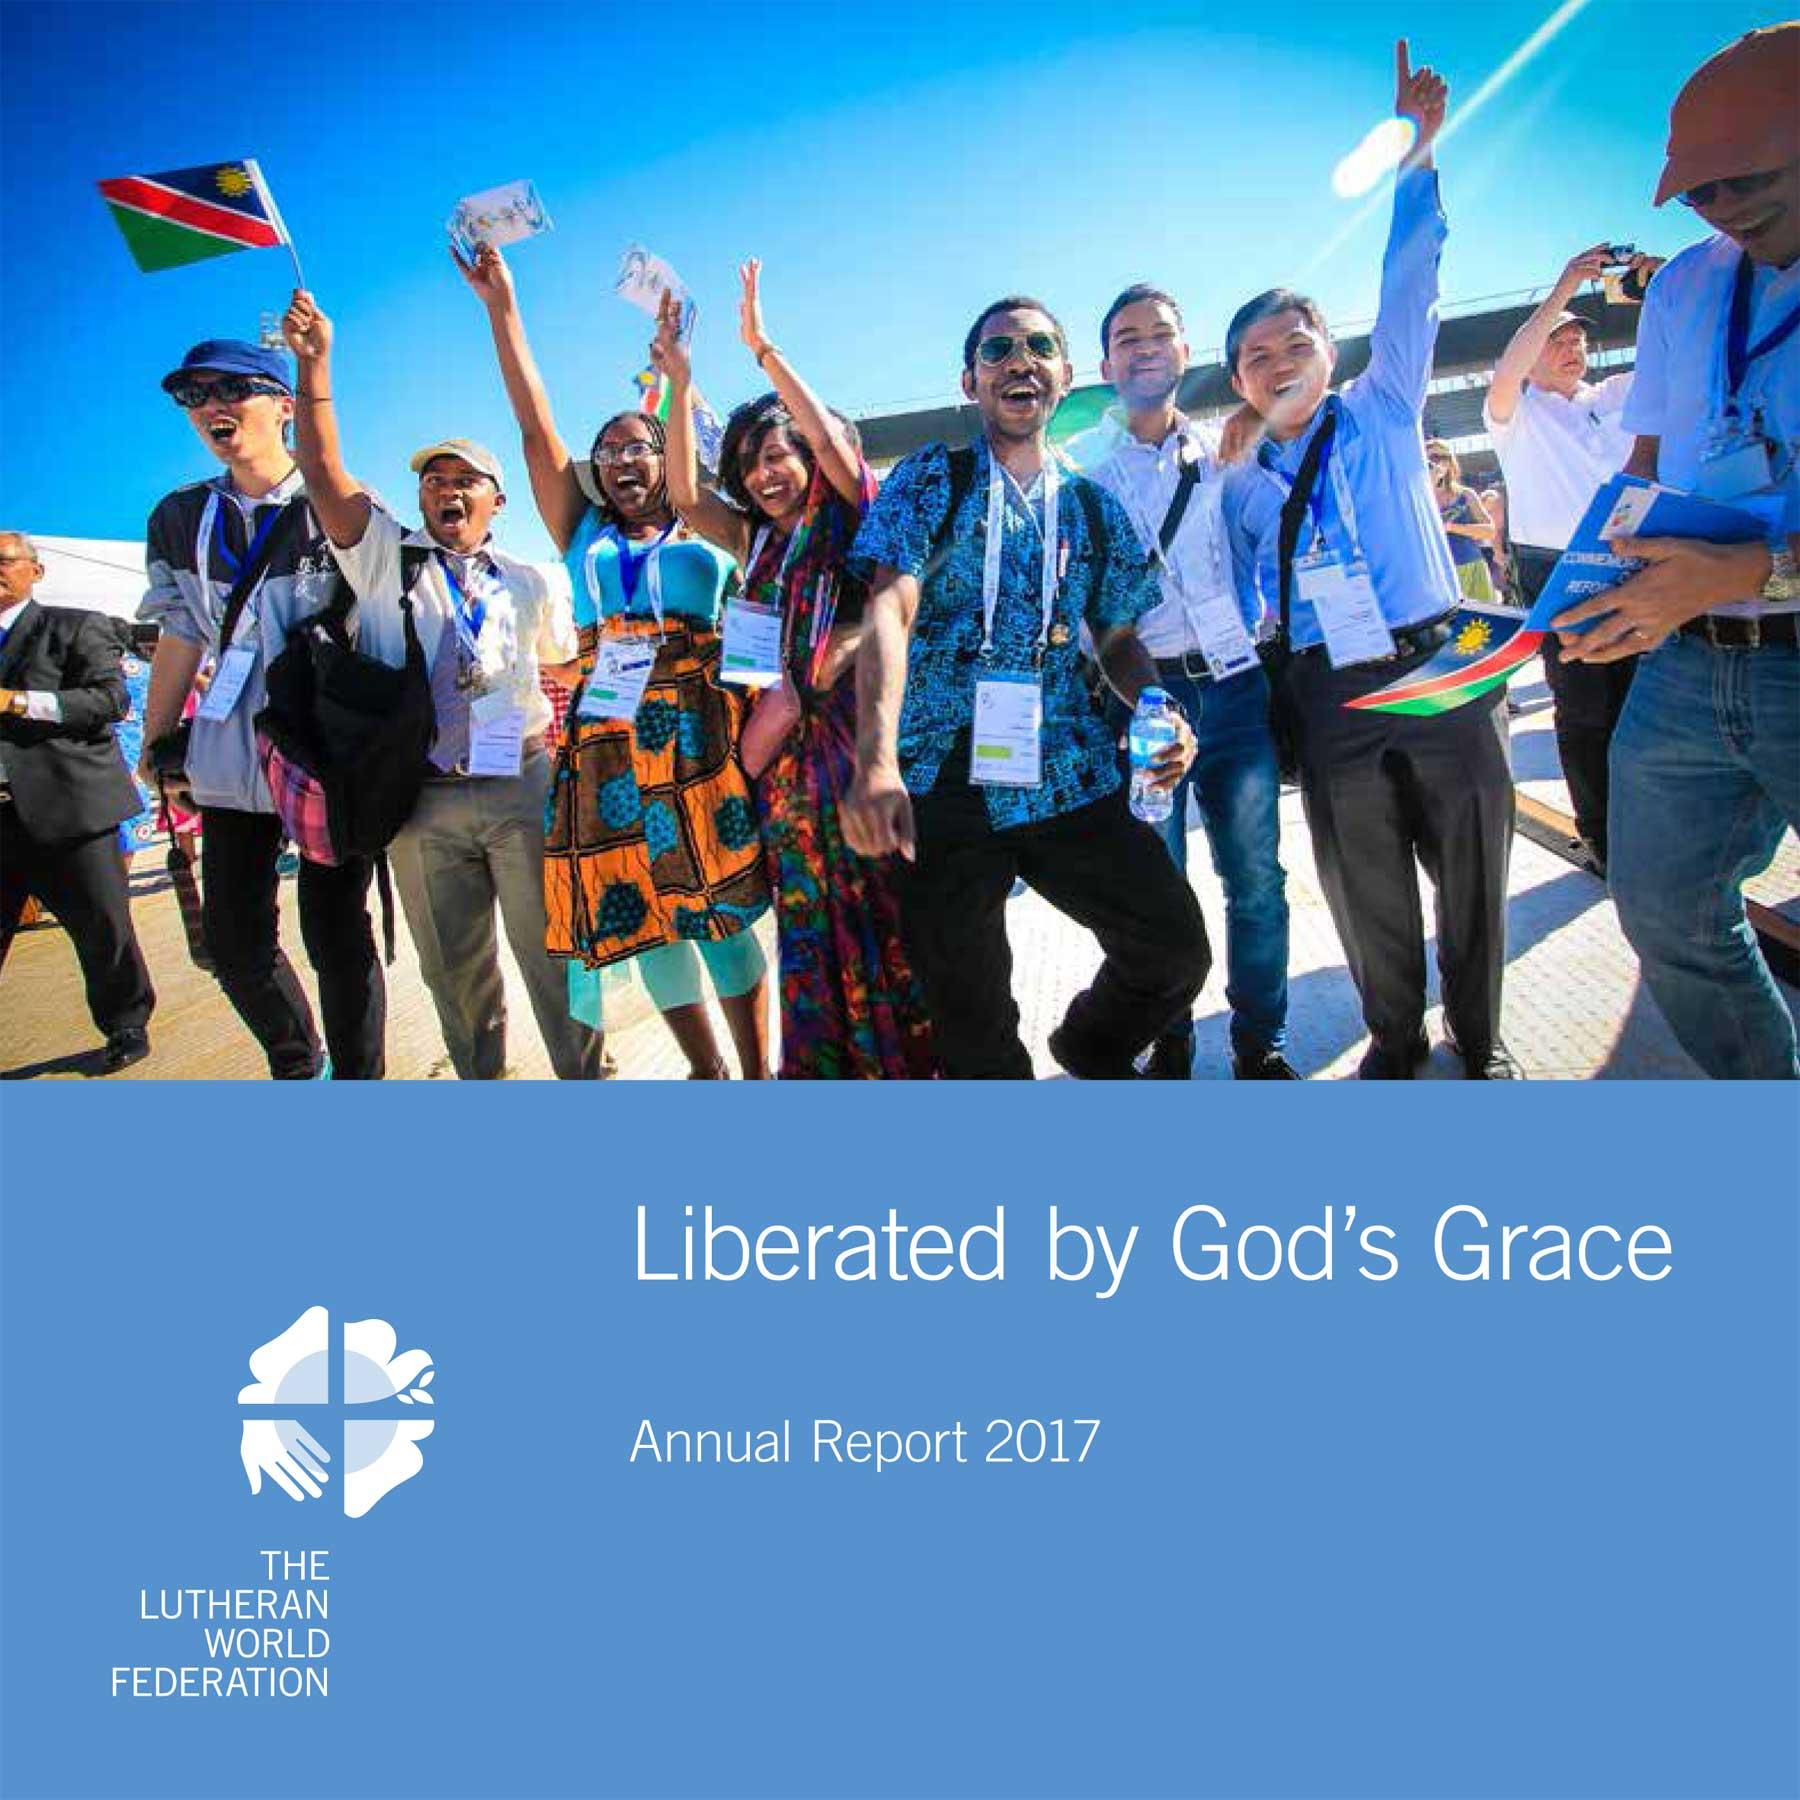 LWF 2017 Annual Report